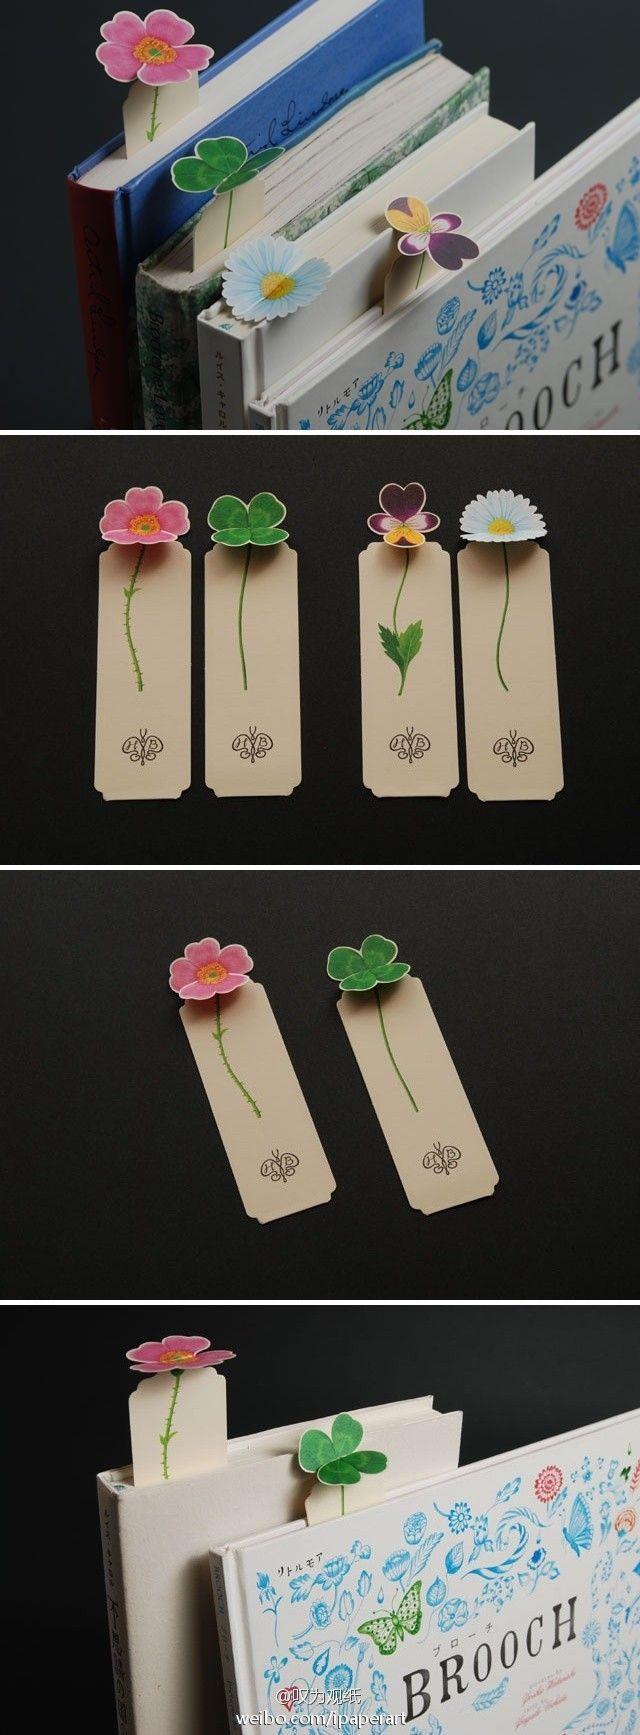 Cute bookmarks